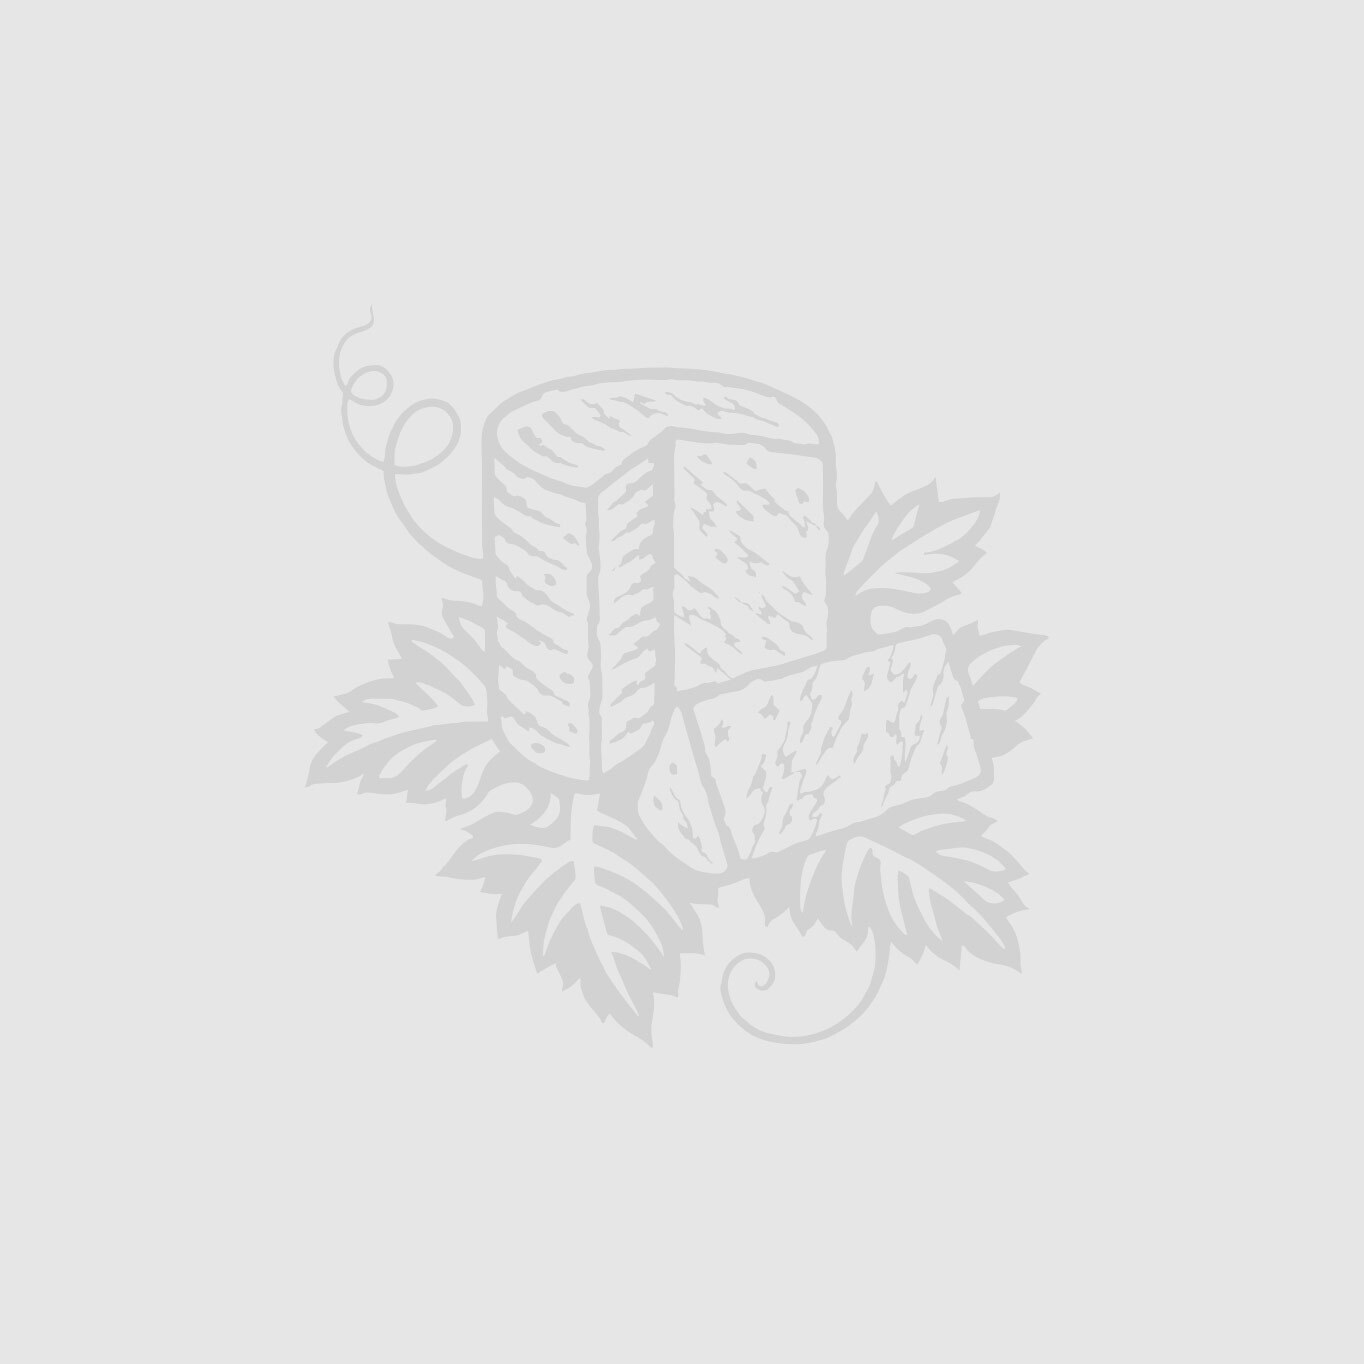 Loison Ovetti Classic Colomba A.D. 1552 750g